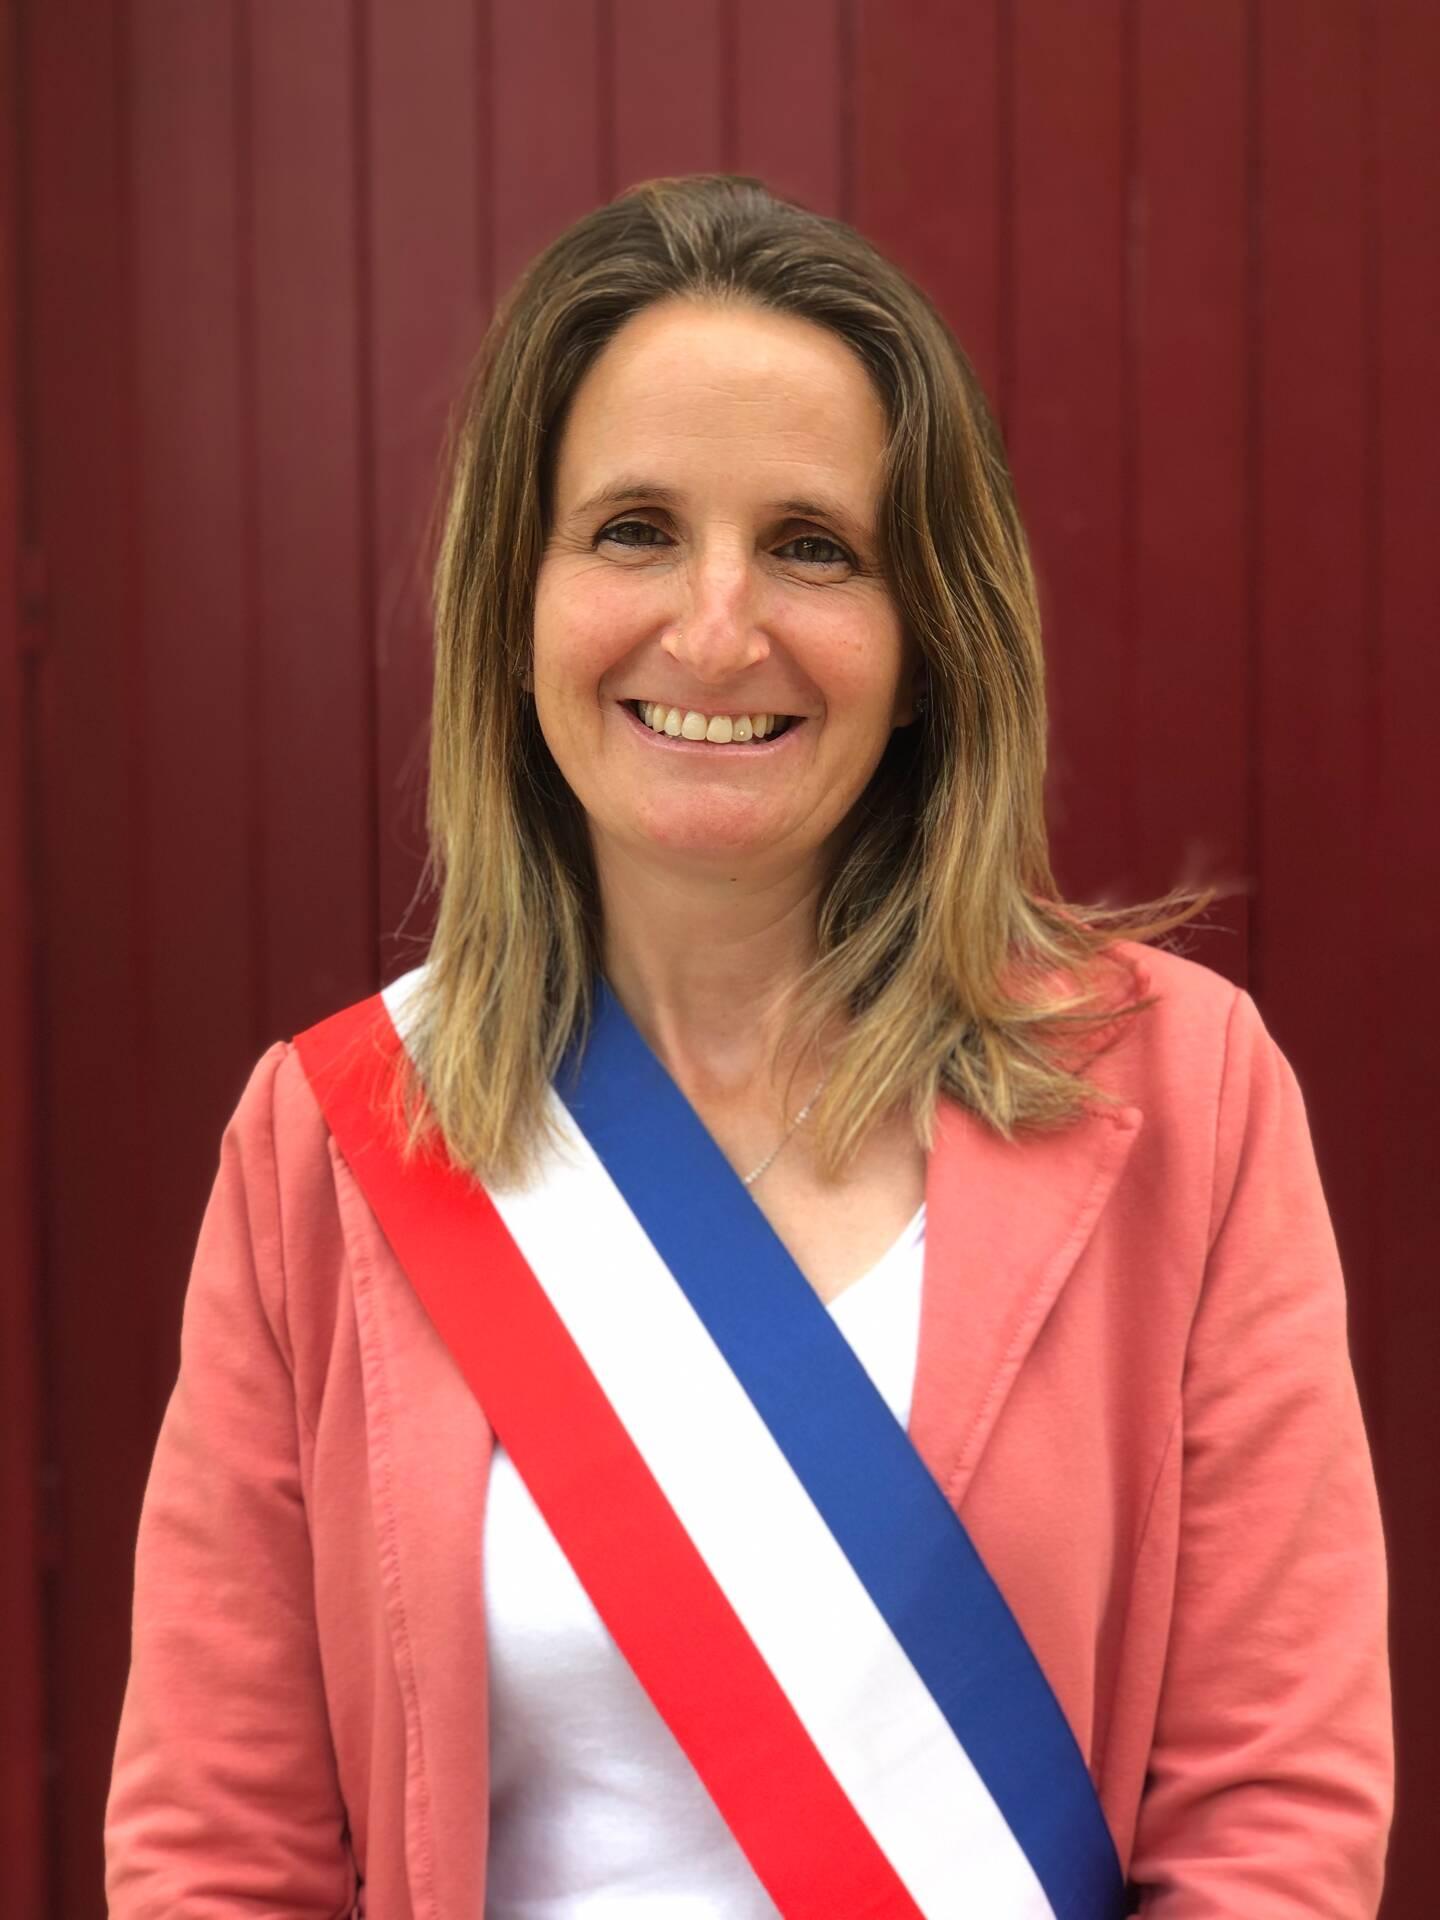 Anne-Marie Curti-Arsento veut relancer l'économie locale.